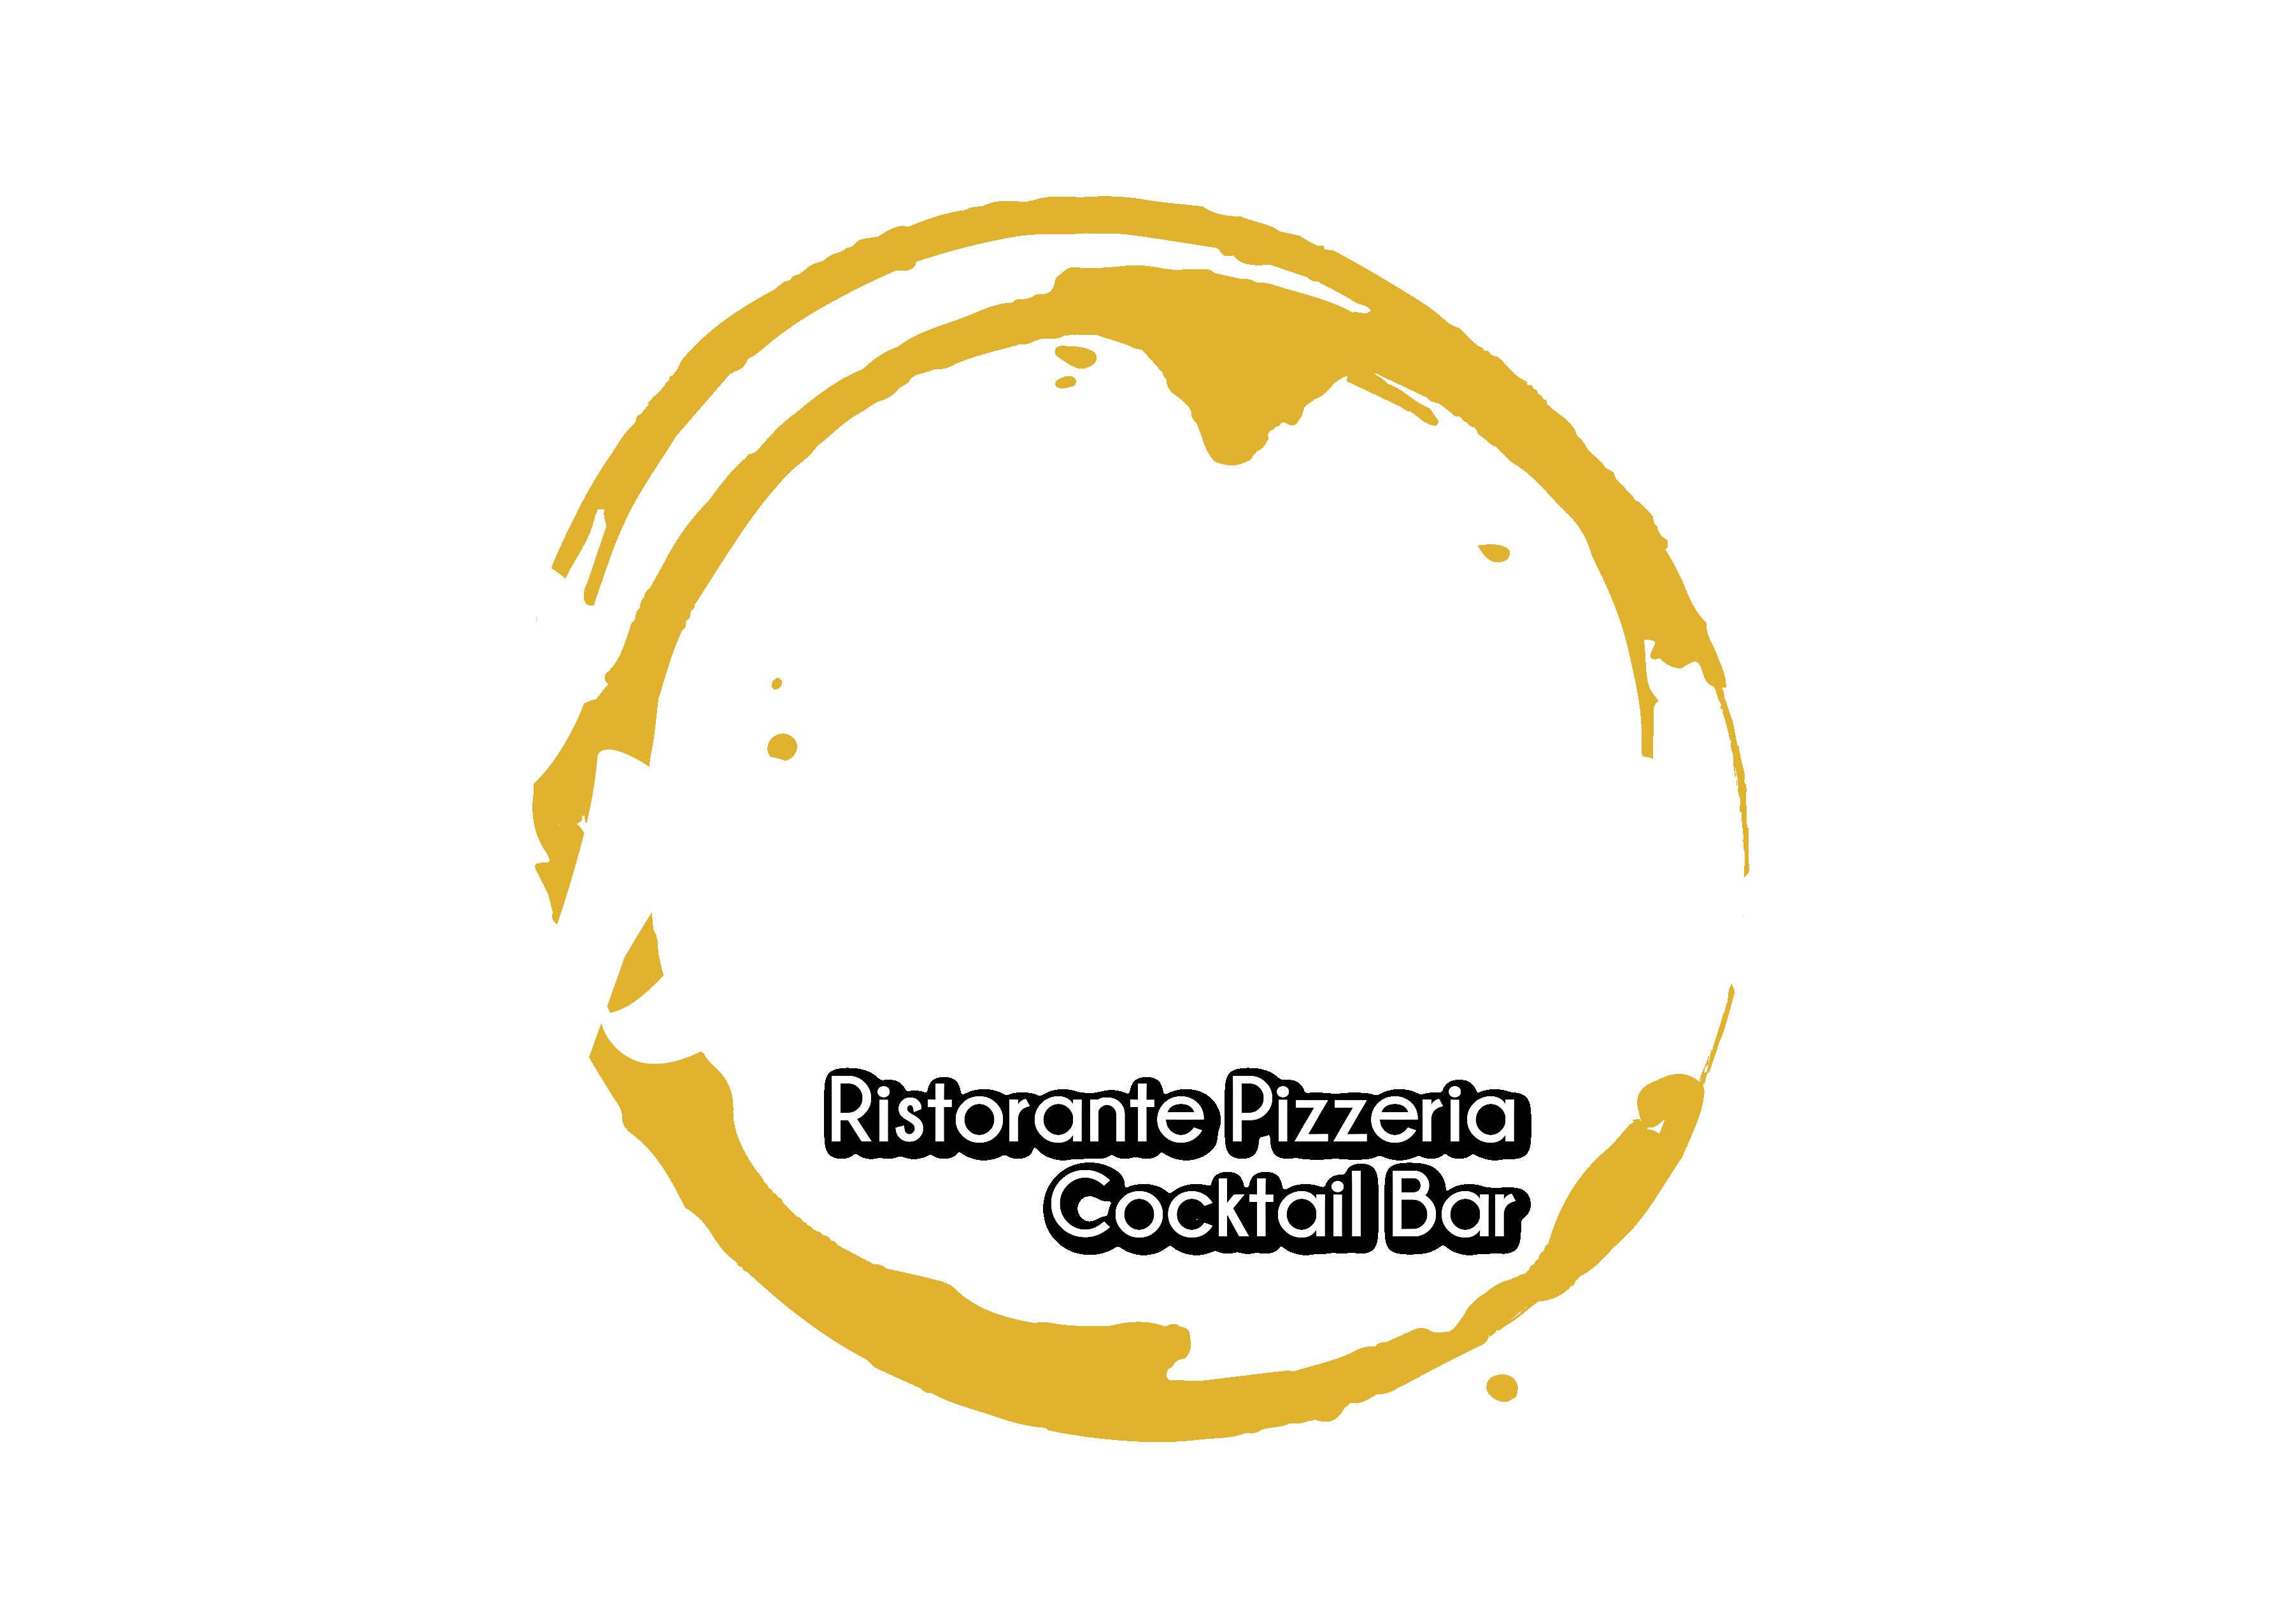 Ristorante Pizzeria Sportec